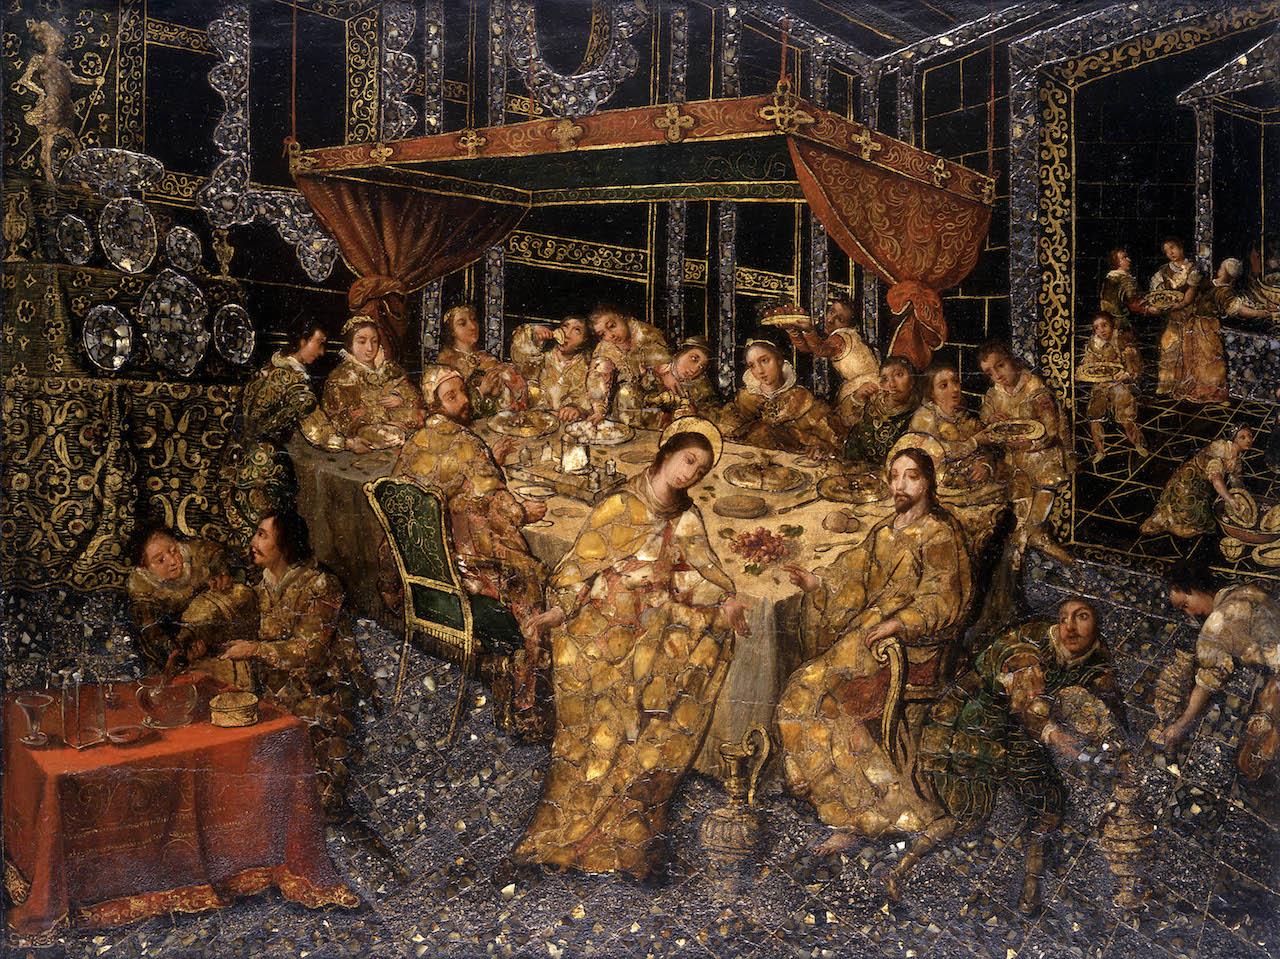 12. Nicolás de Correa, Las bodas de Caná